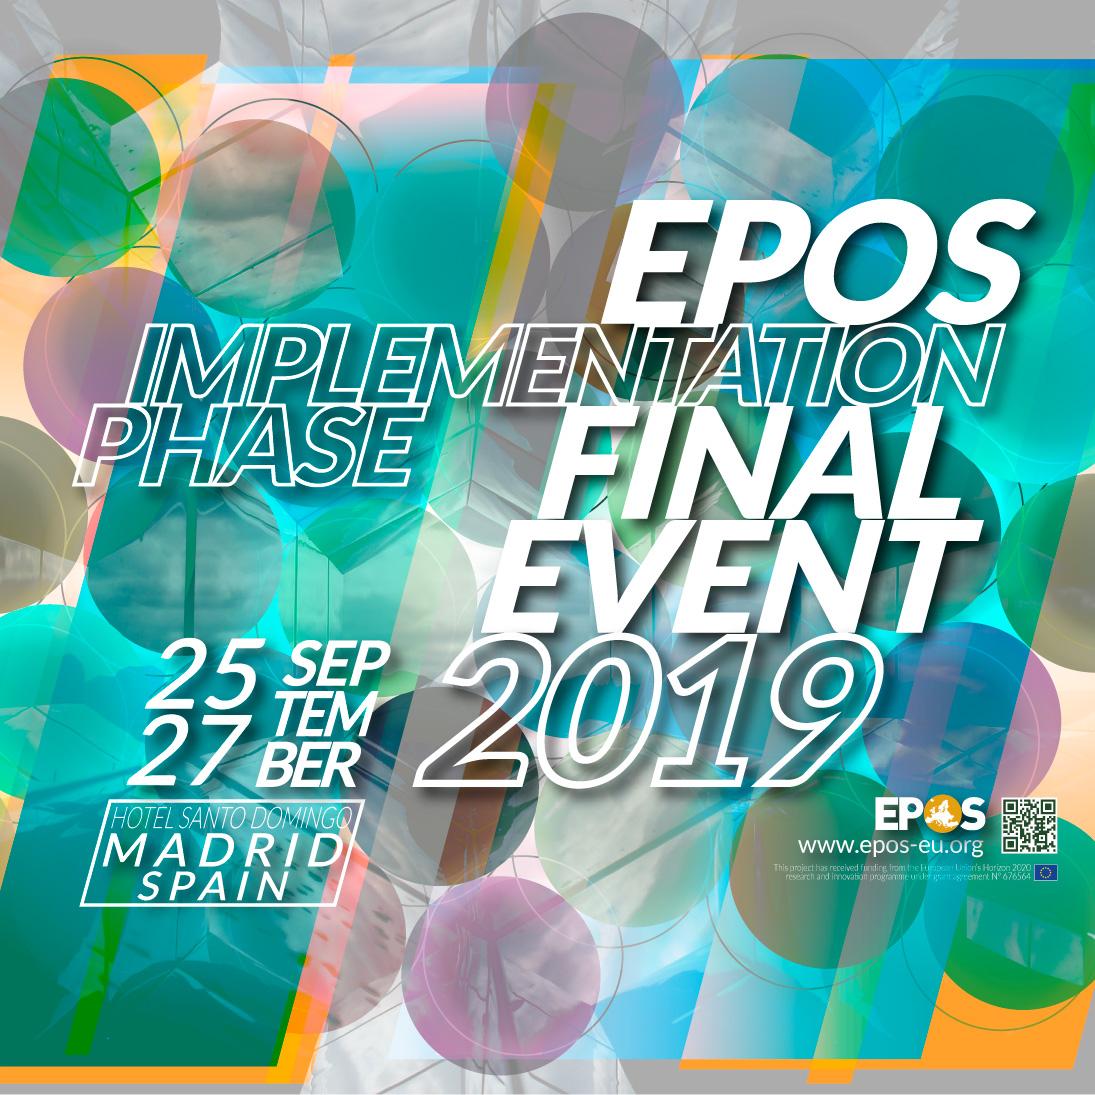 Epos IP Final Event